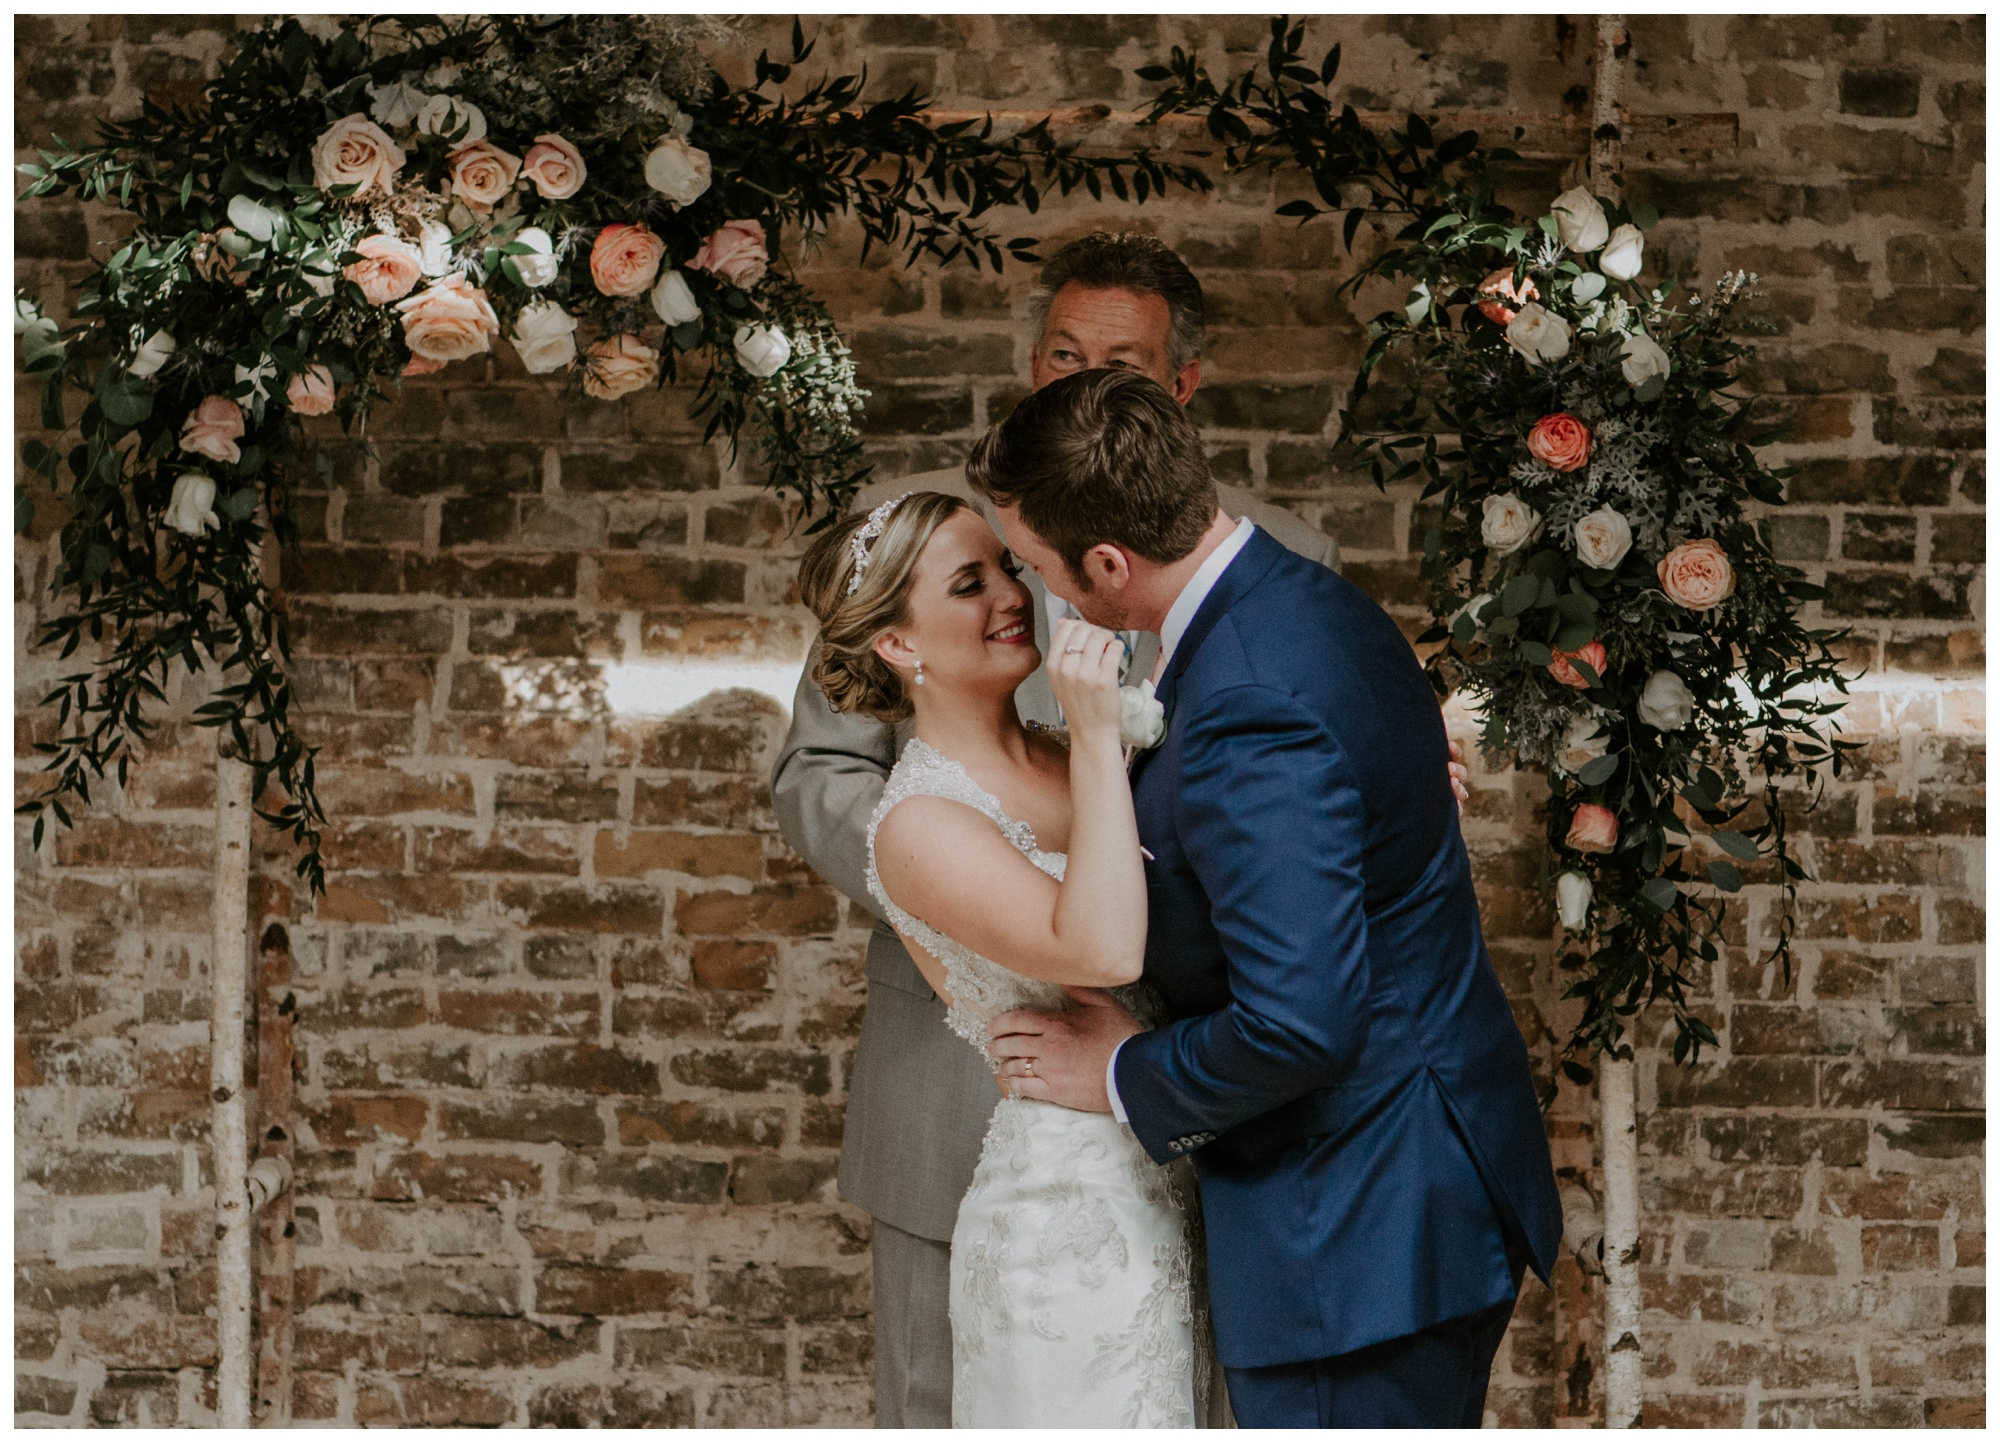 austin-texas-wedding-photography-1778-photographie_0072.jpg